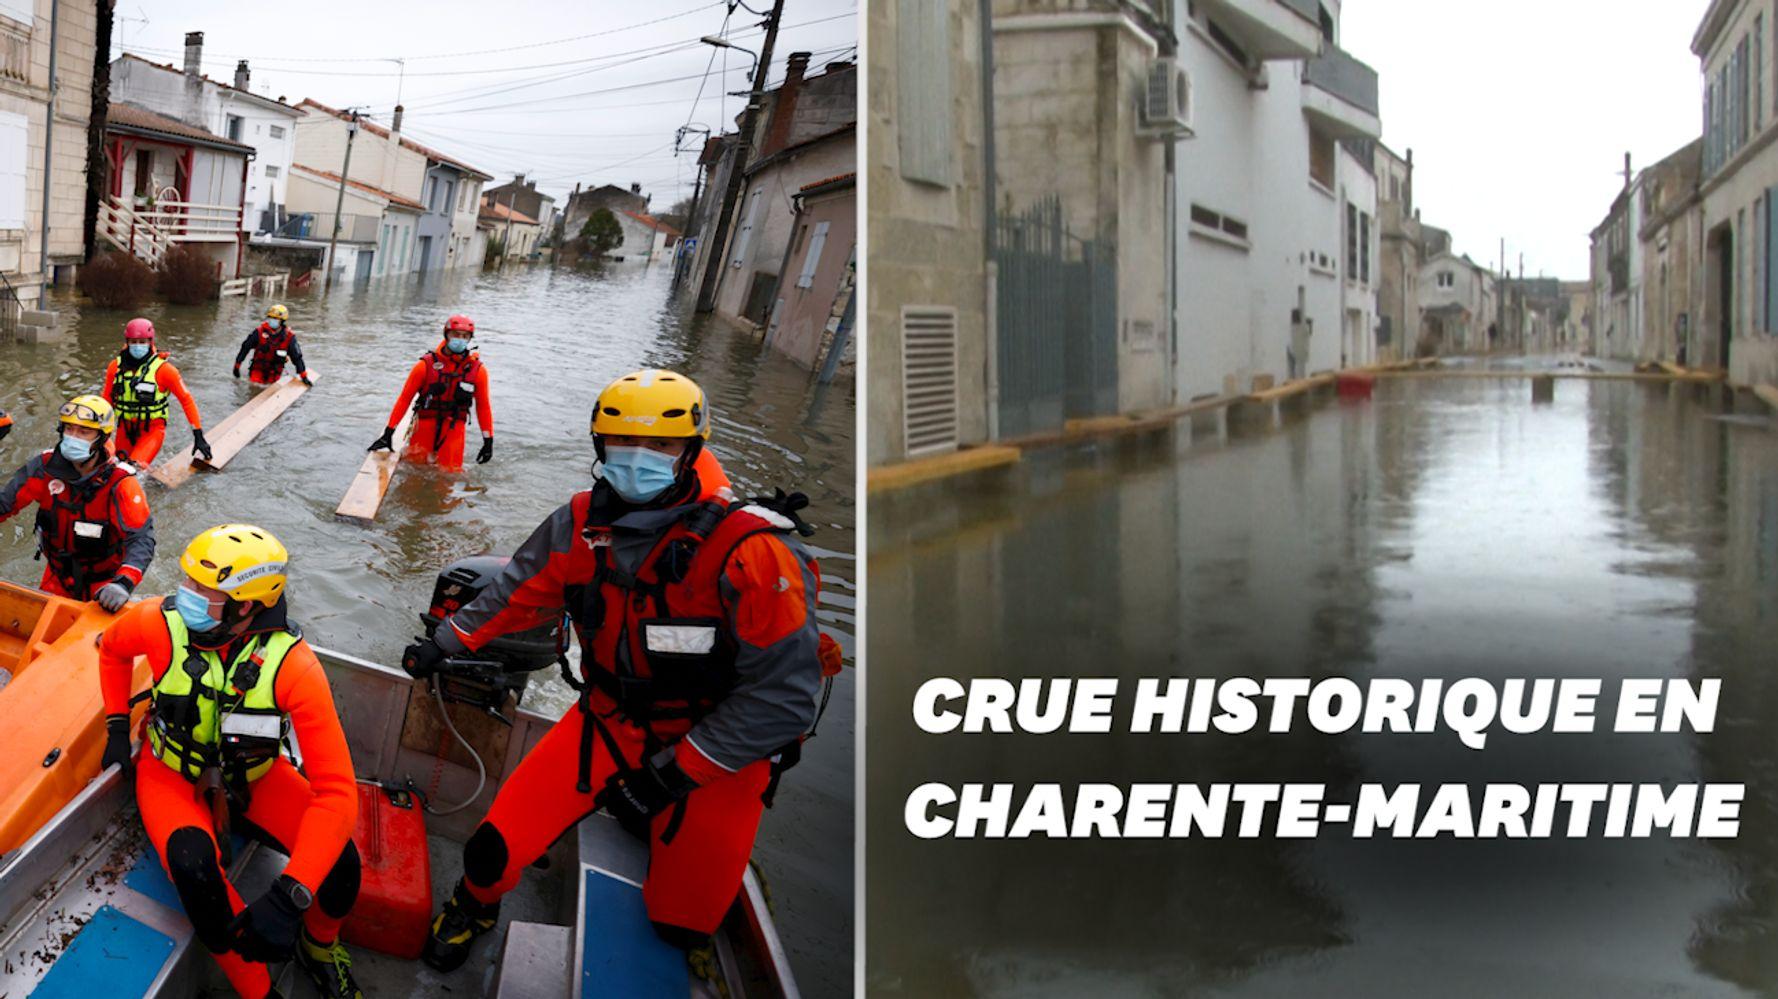 Les rues de Saintes inondées après la crue de la Charente